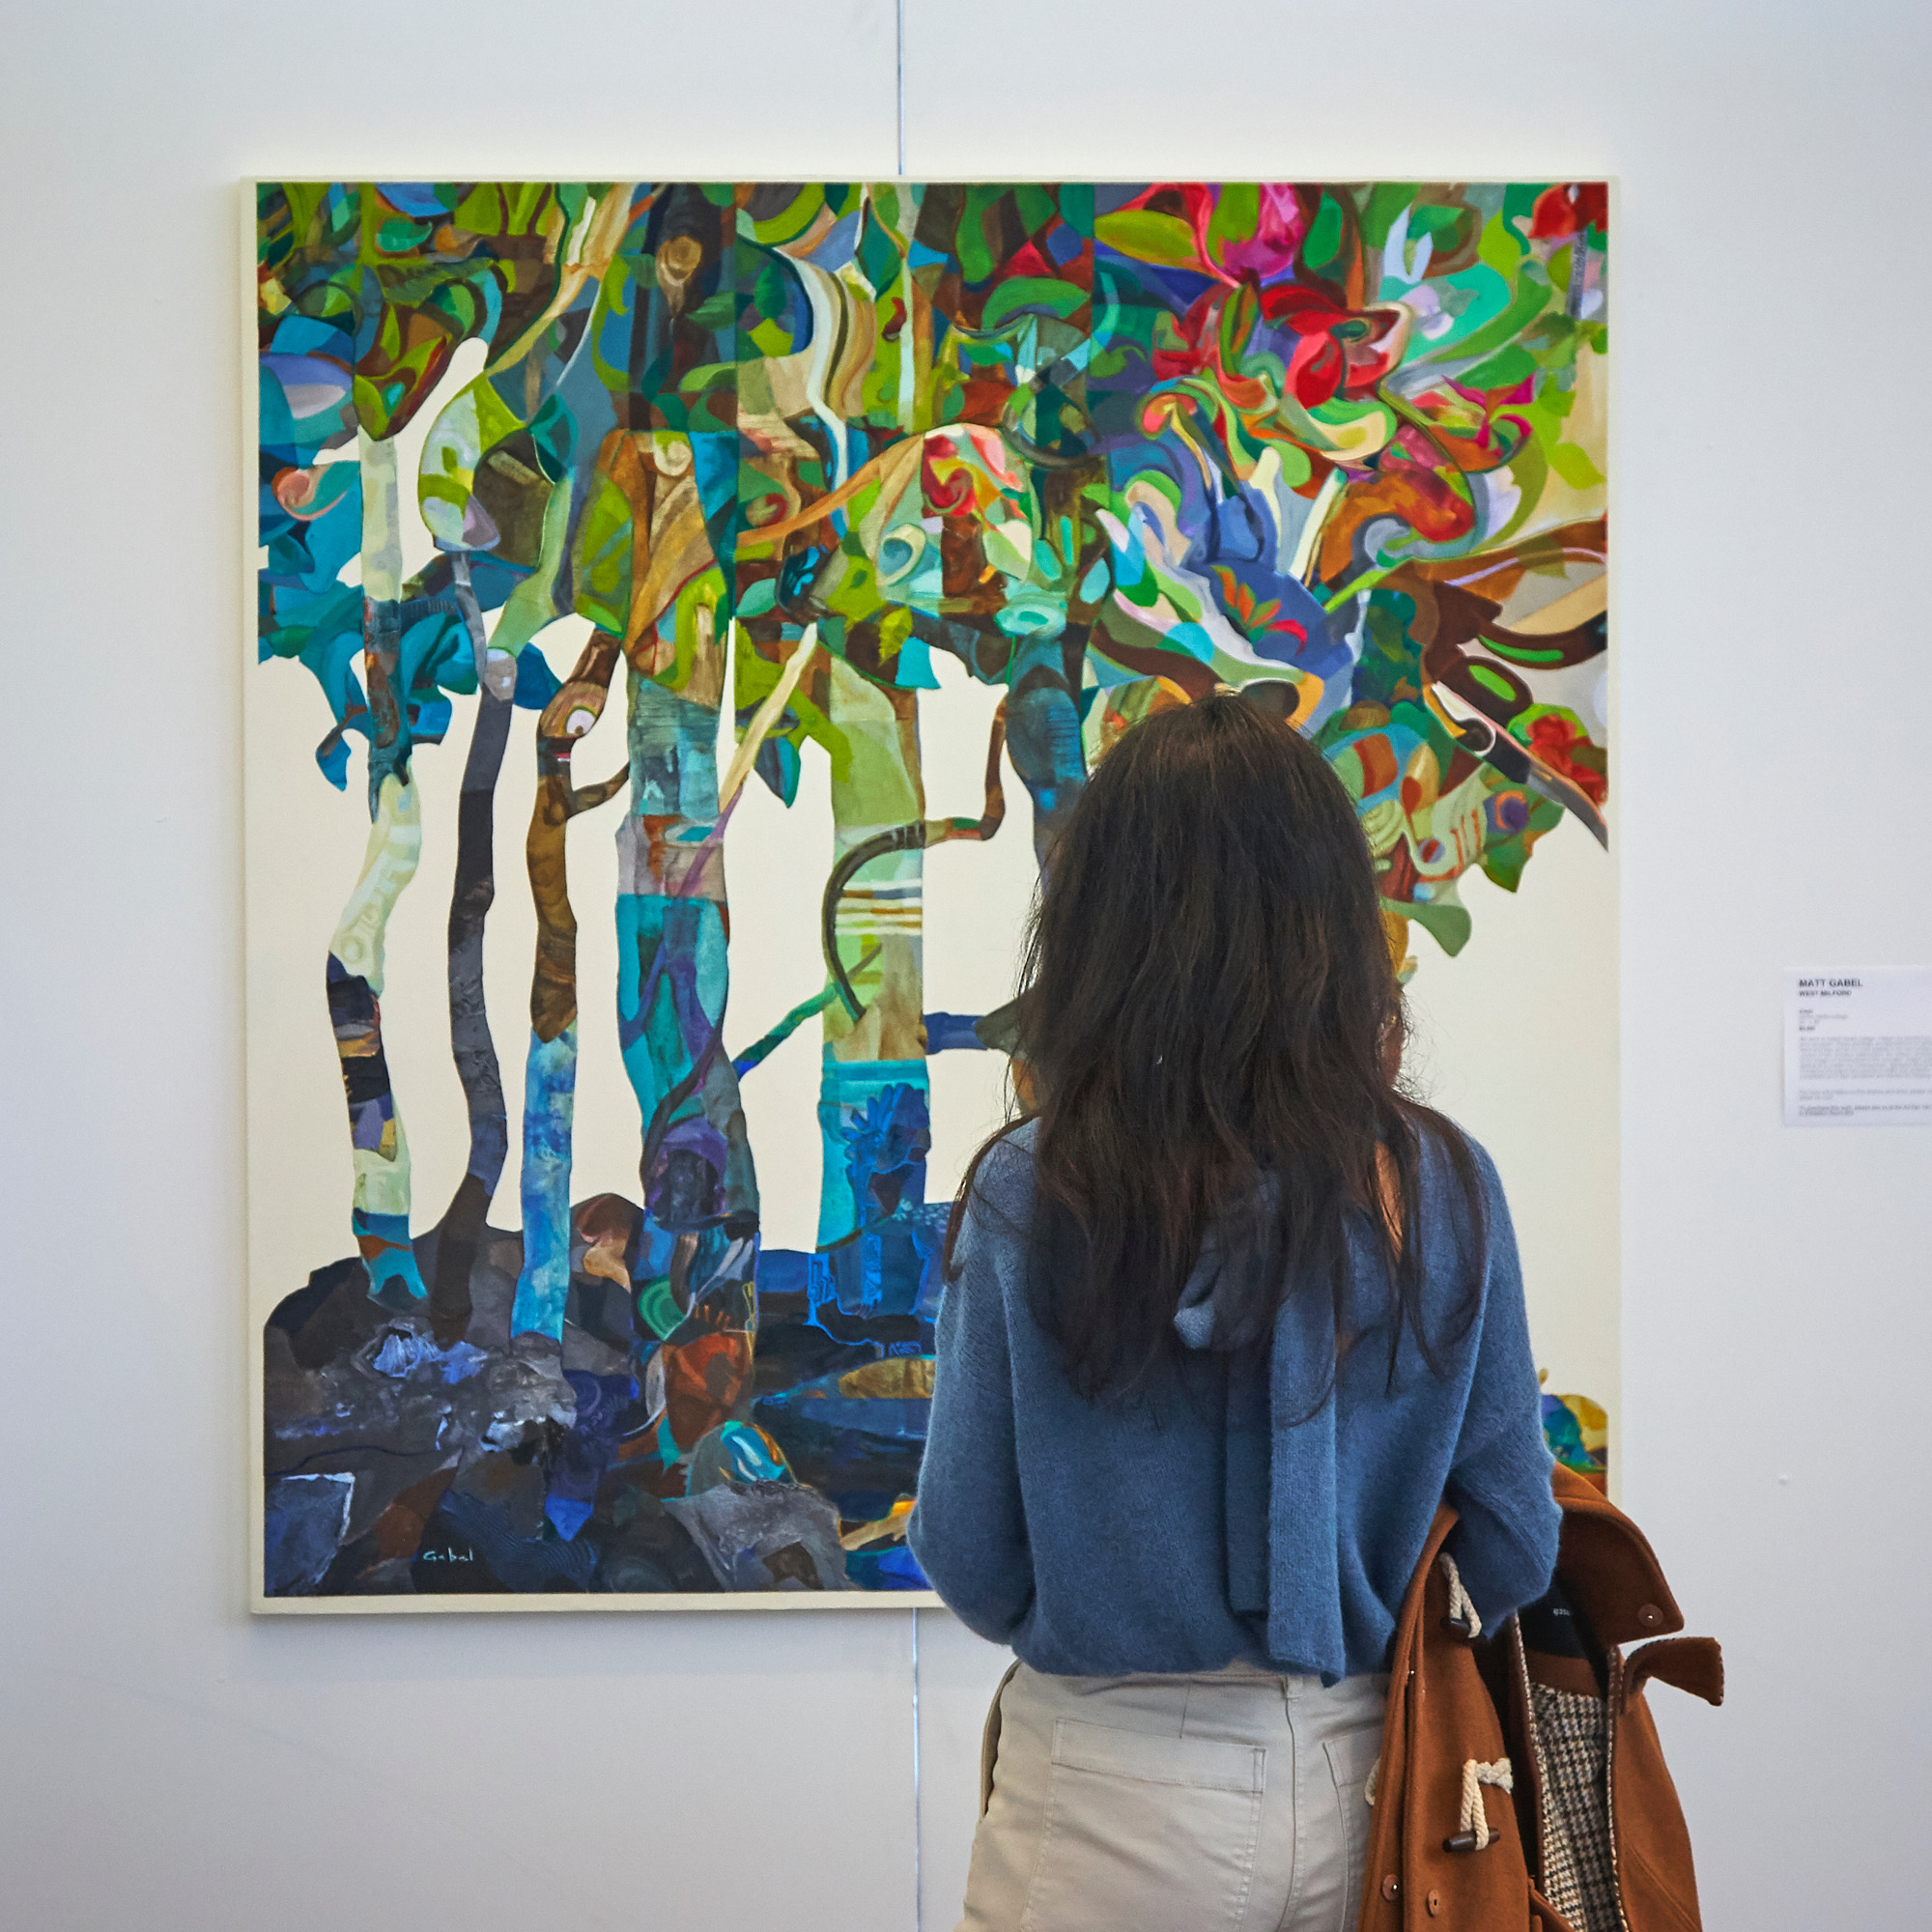 Painting by Matt Gabel in the 2020 Juried Show at Art Fair 14C